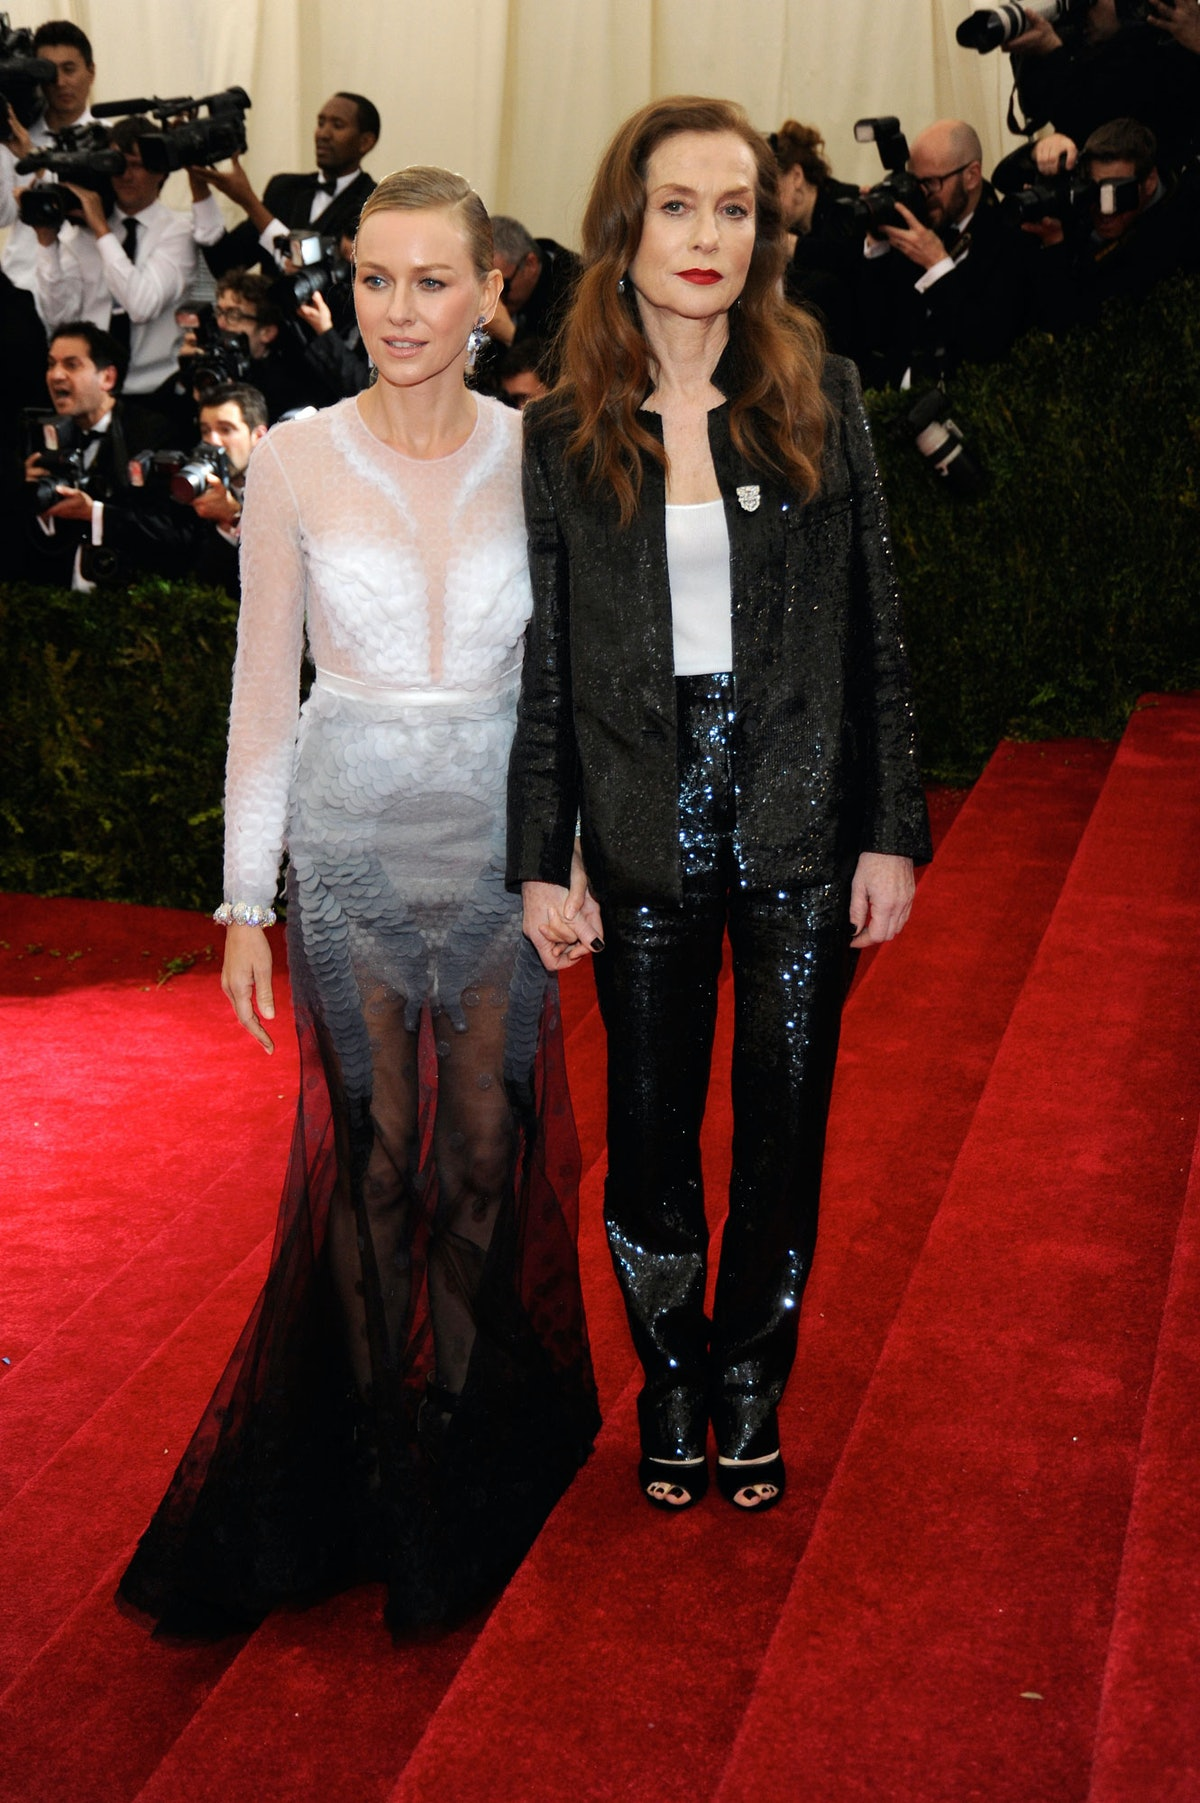 Naomi Watts and Isabelle Huppert